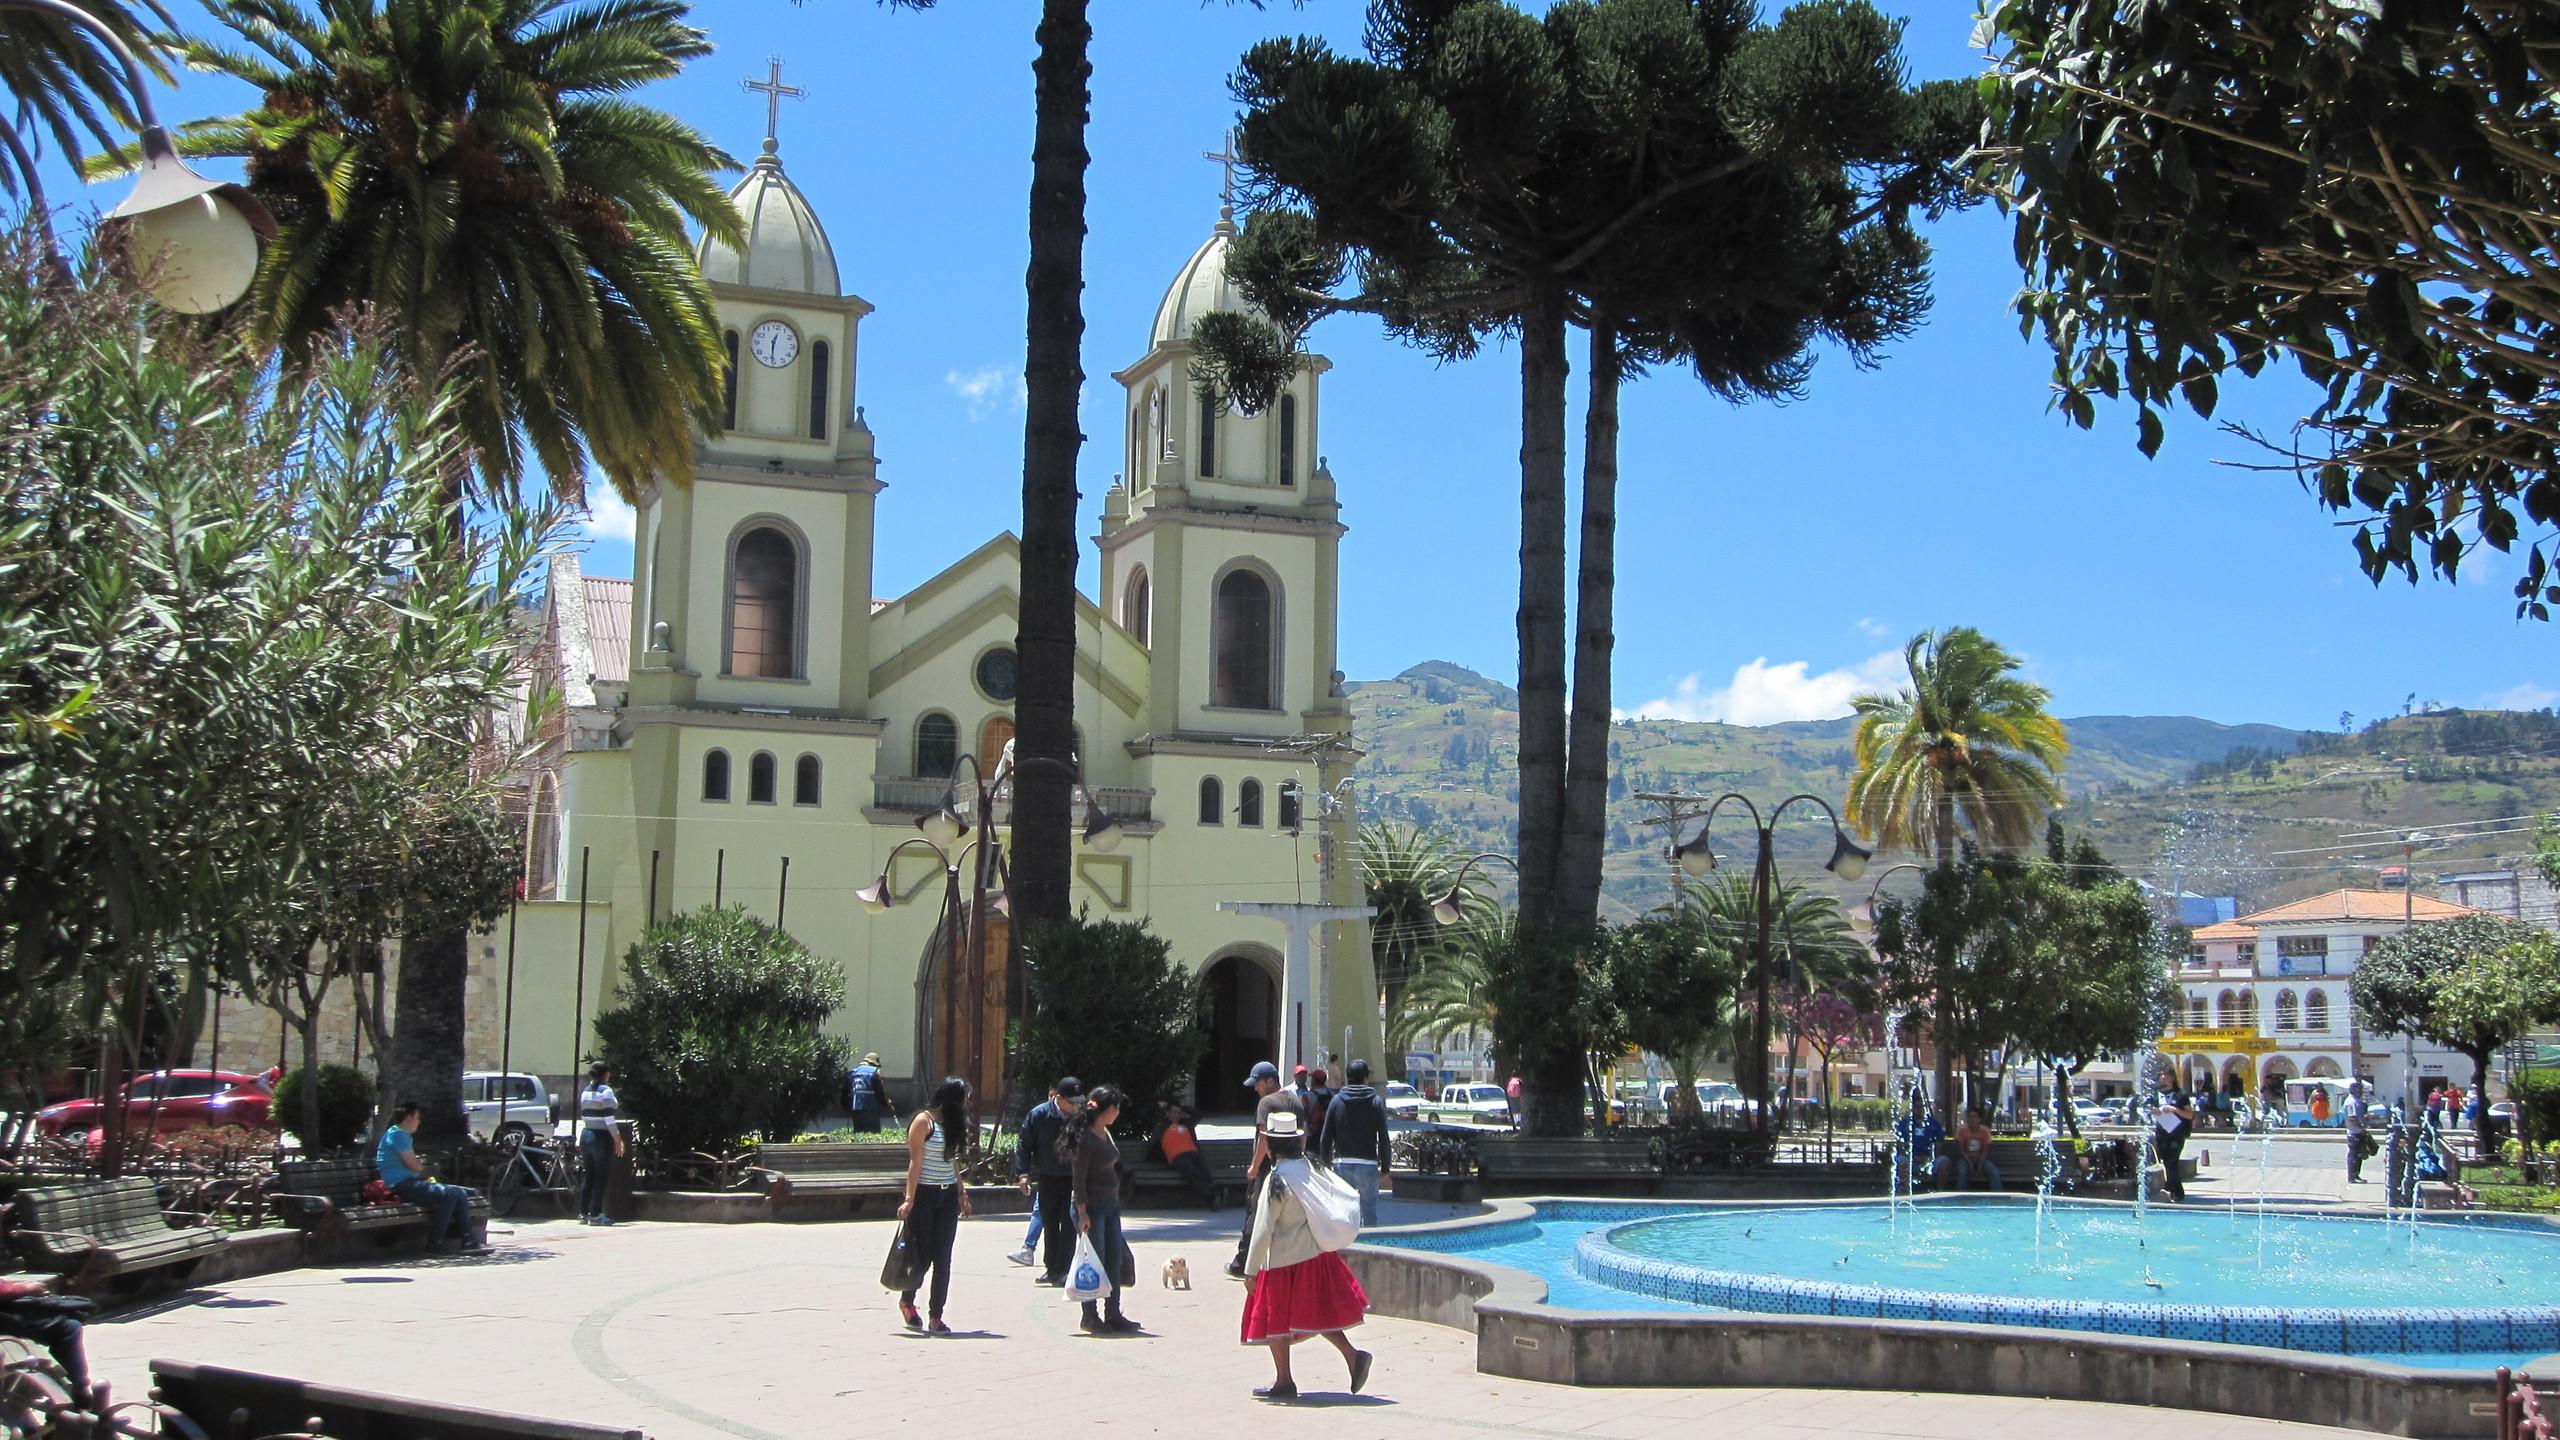 The tiny town of Santa Barbara